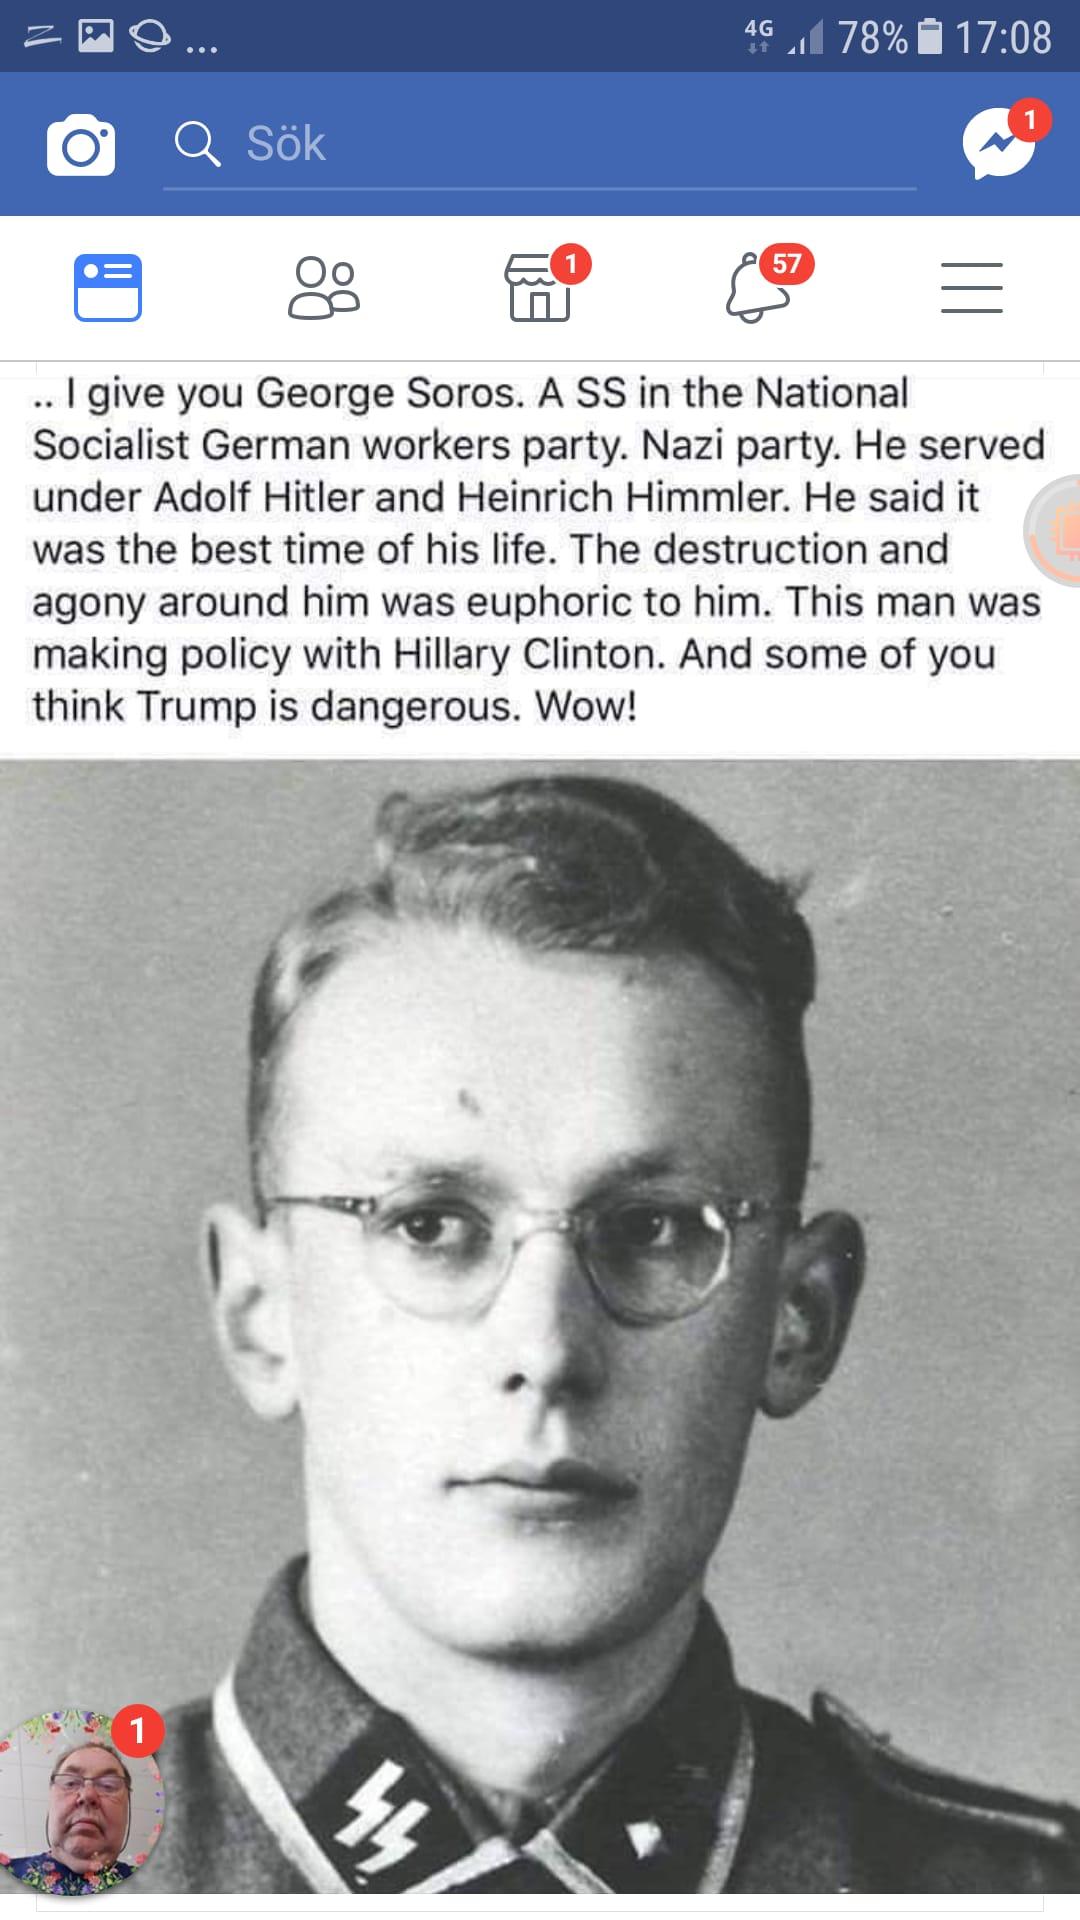 Hitler halsning muslimhat sanning riktig karl